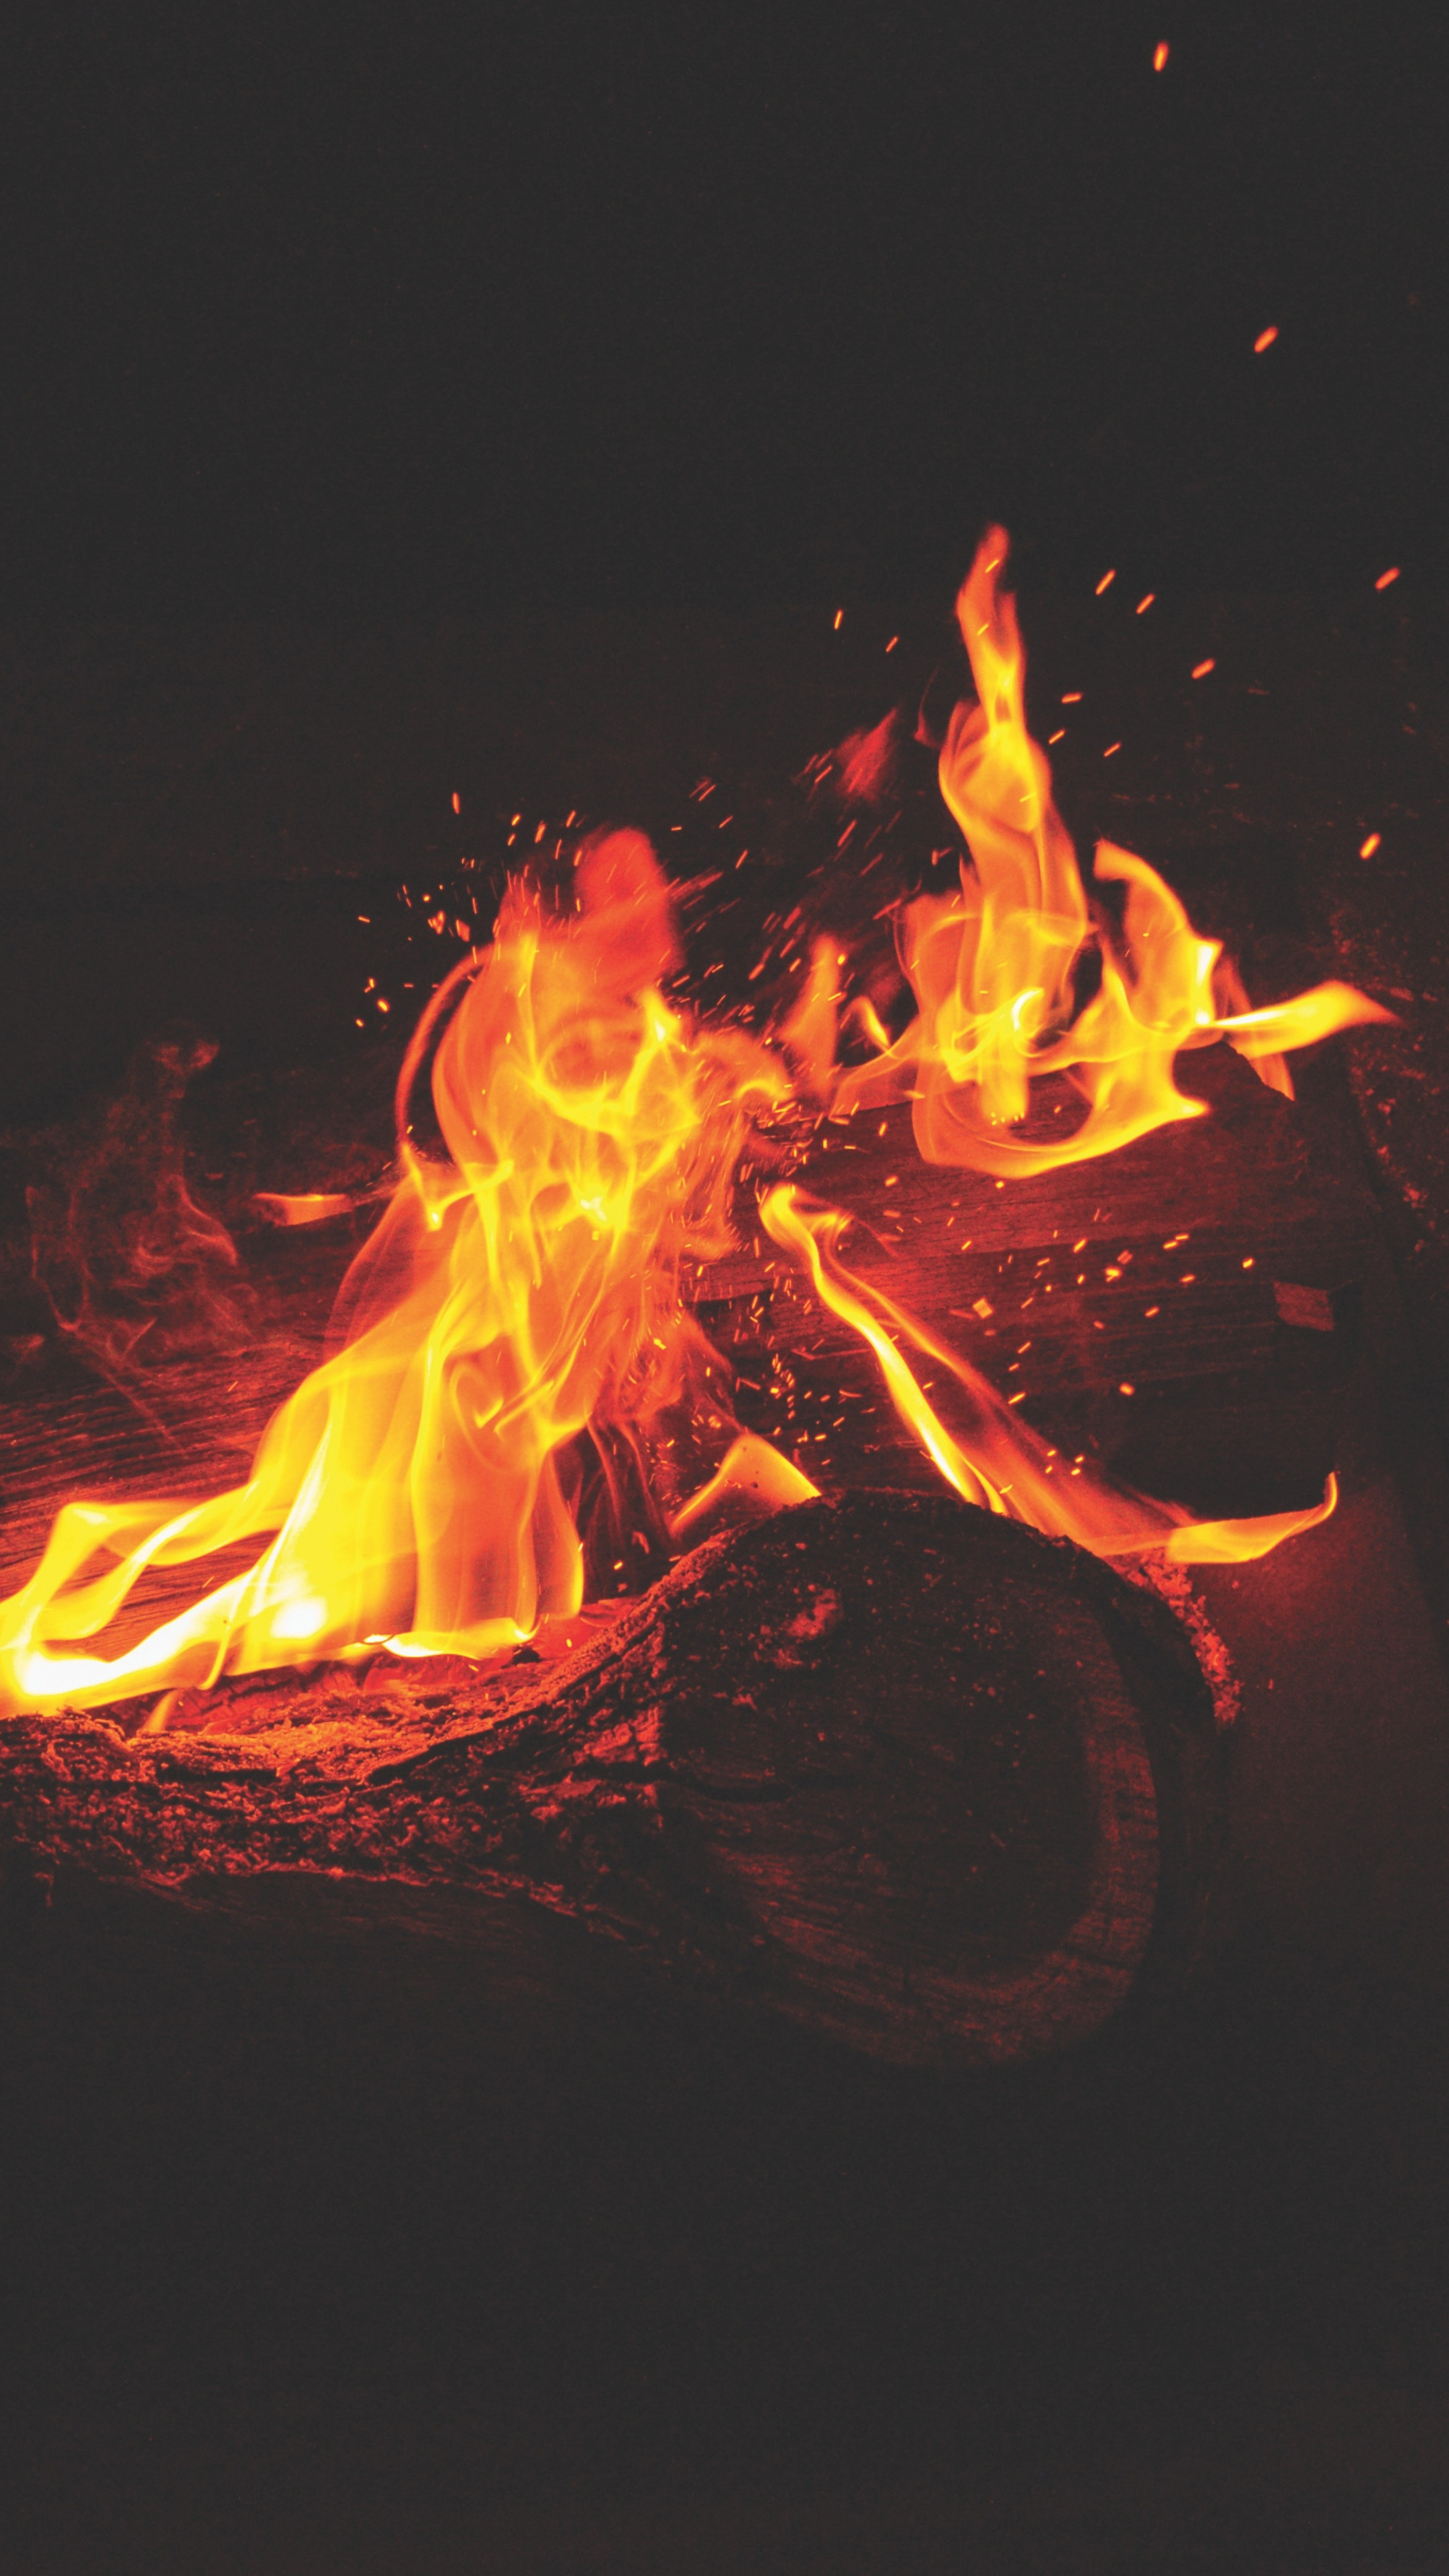 Whatsapp Car Wallpaper Download Bonfire Fire Flames Sparks Wallpaper 2160x3840